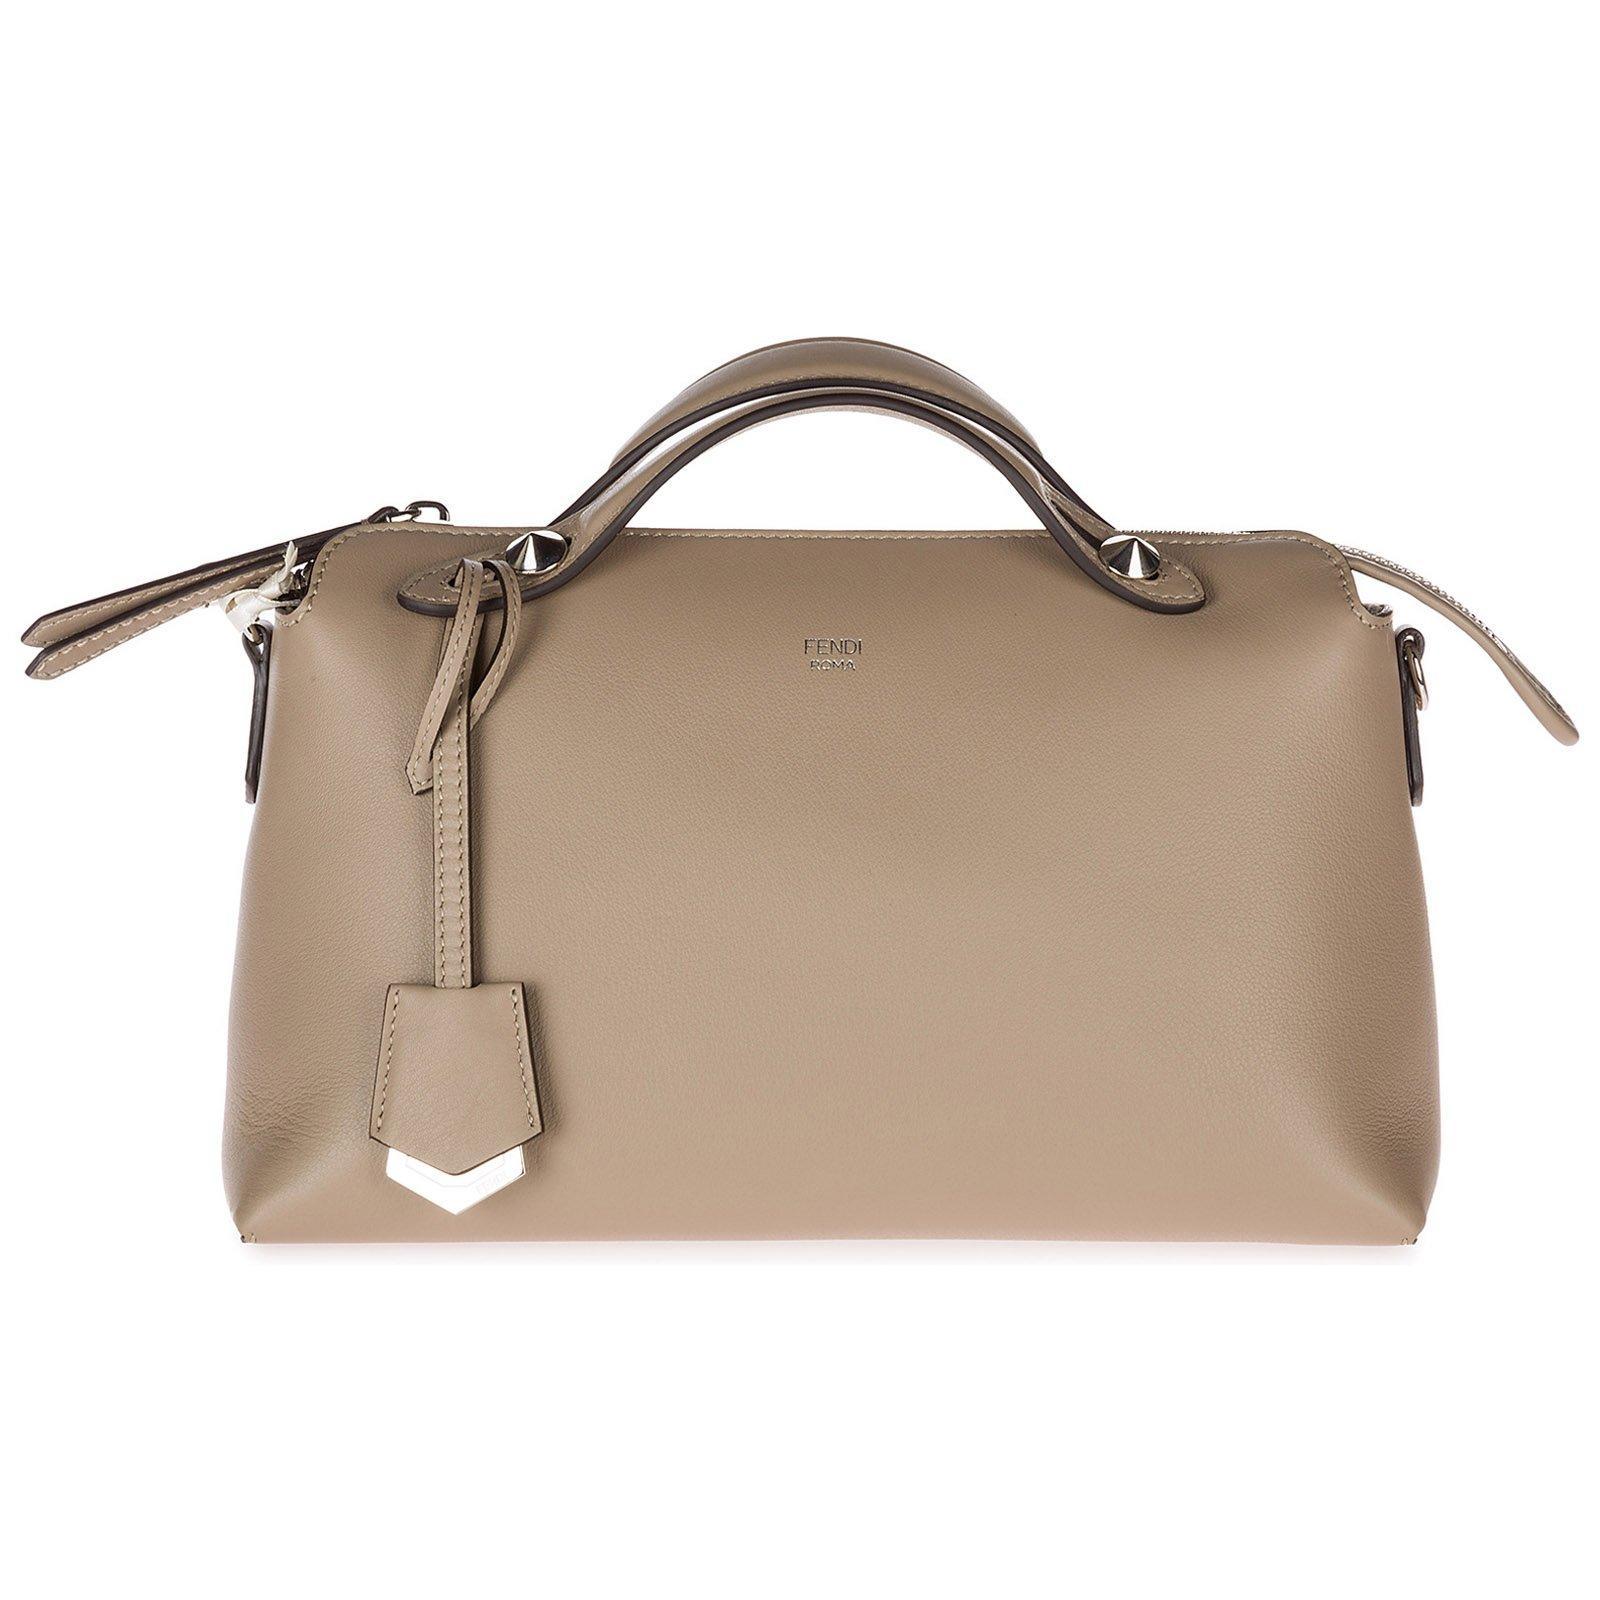 Fendi By The Way Boston Bag in Brown - Lyst fa7de3c2cfabd